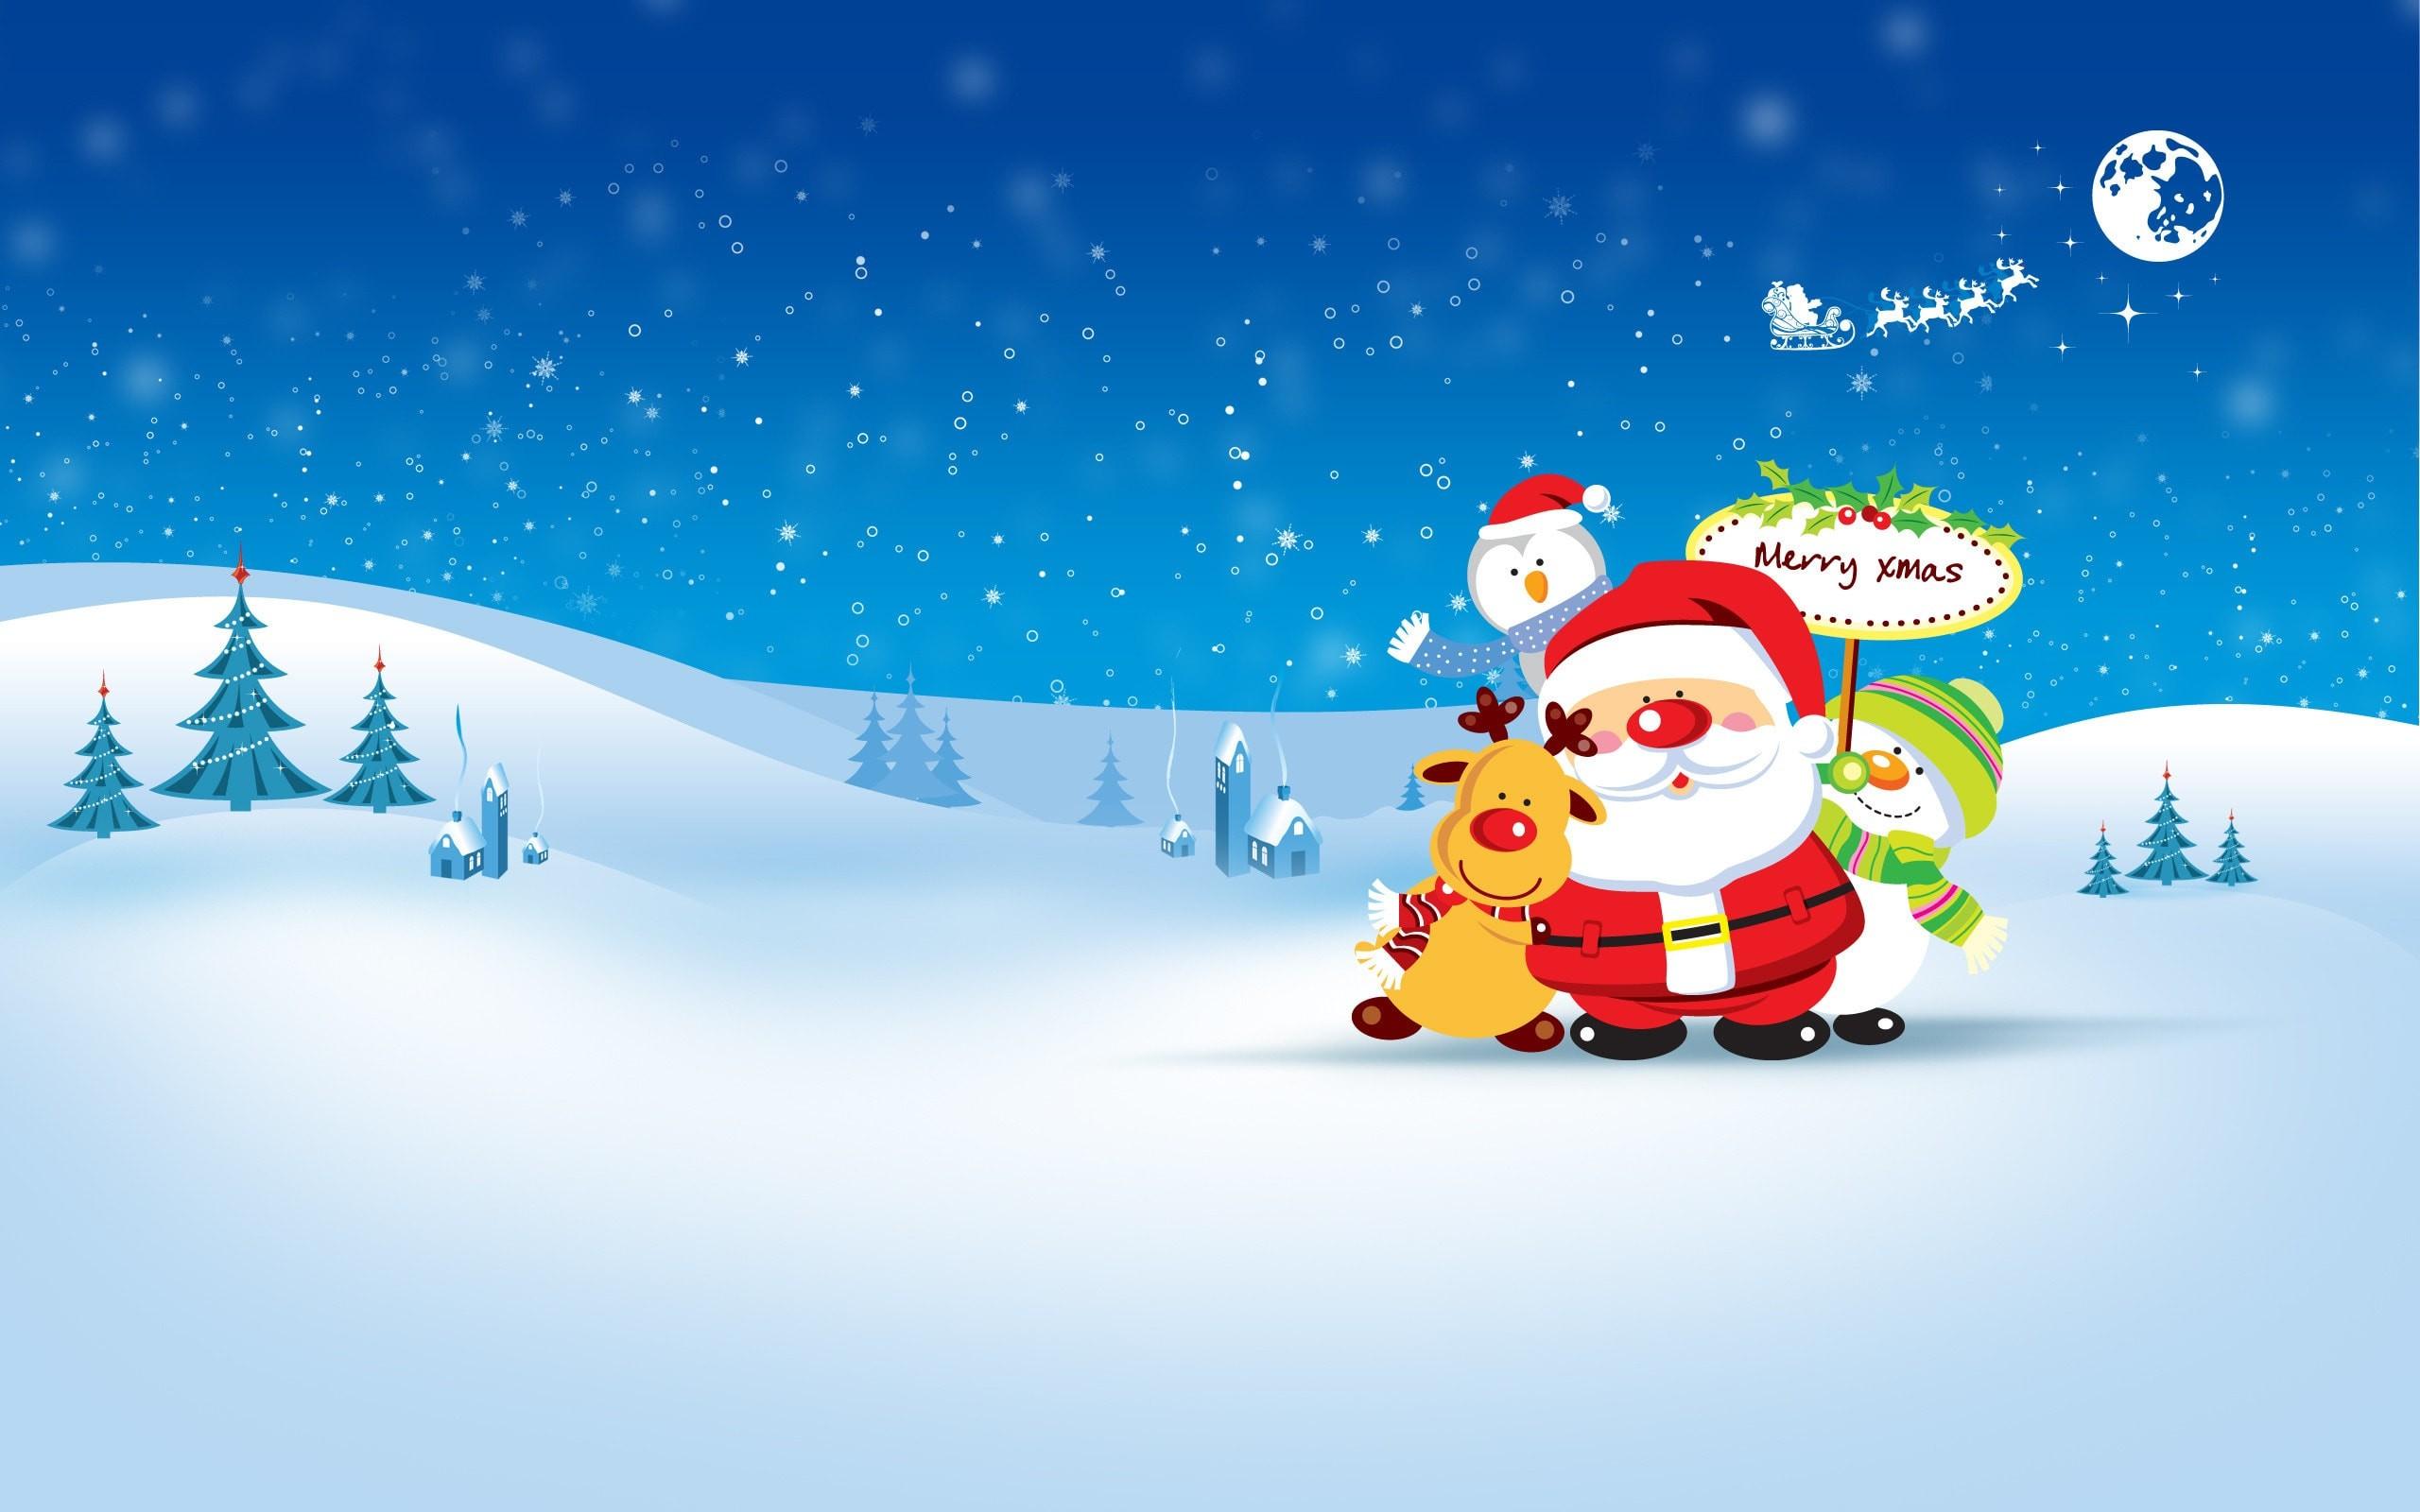 Santa Claus Backgrounds Santa Claus Wallpaper